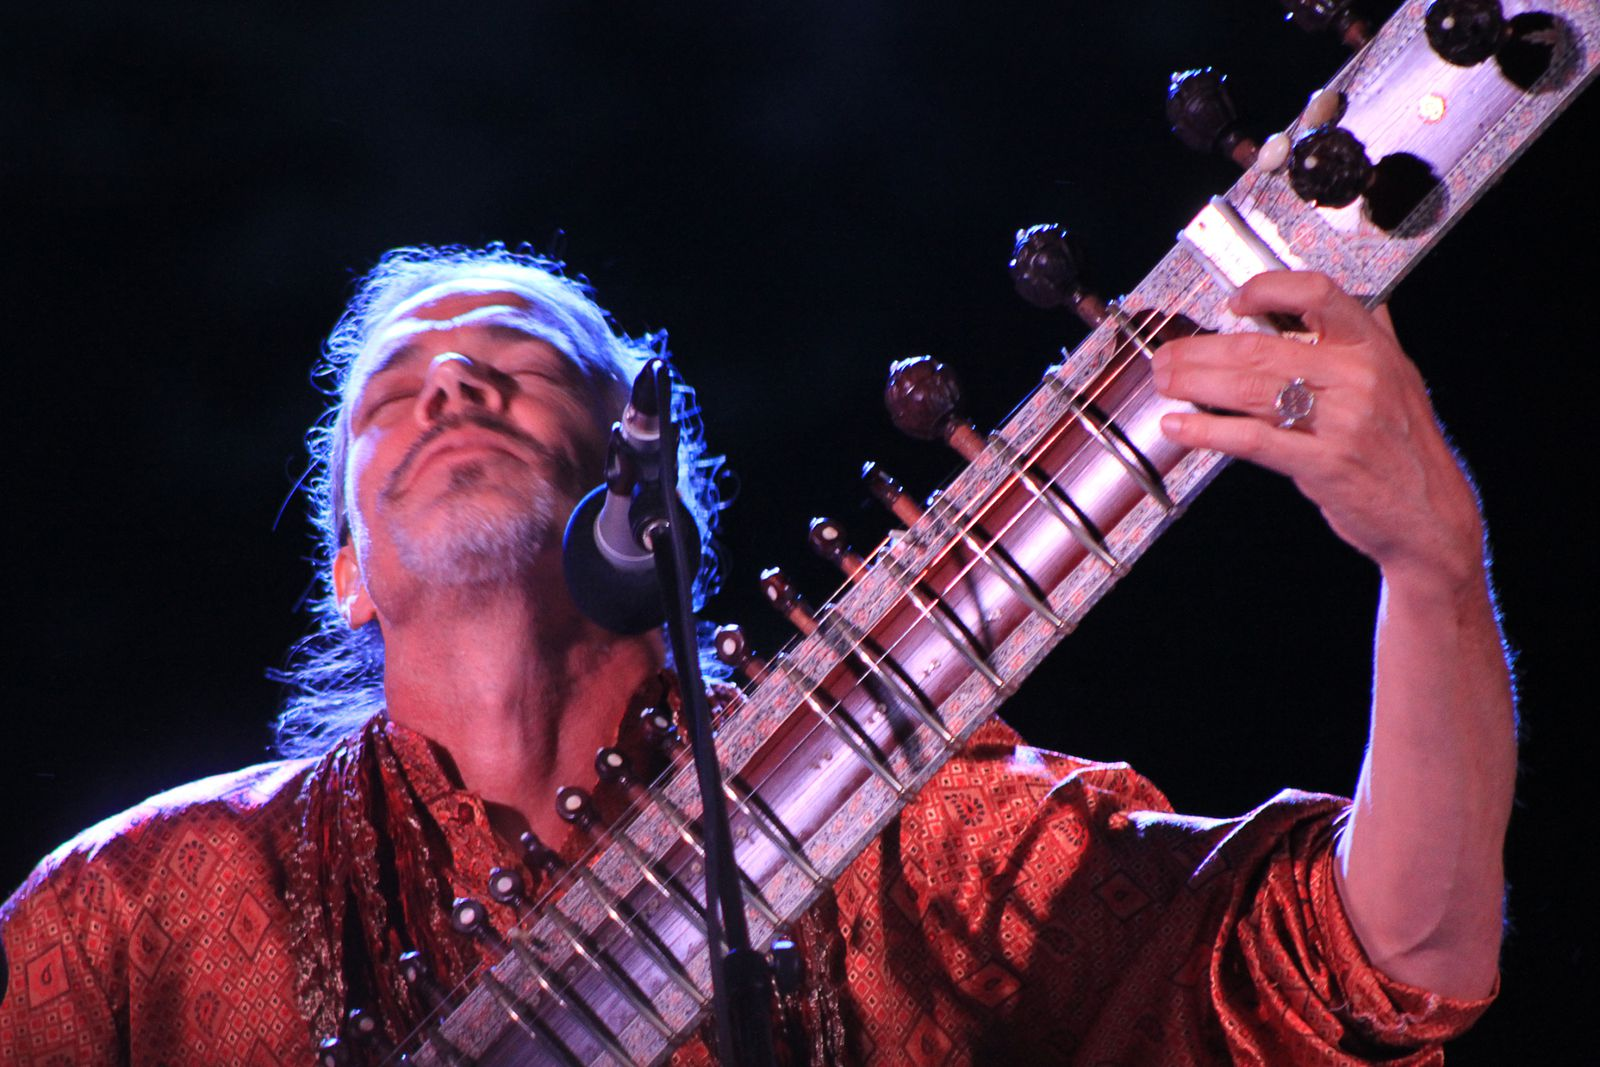 festi-spirit 2012 095b